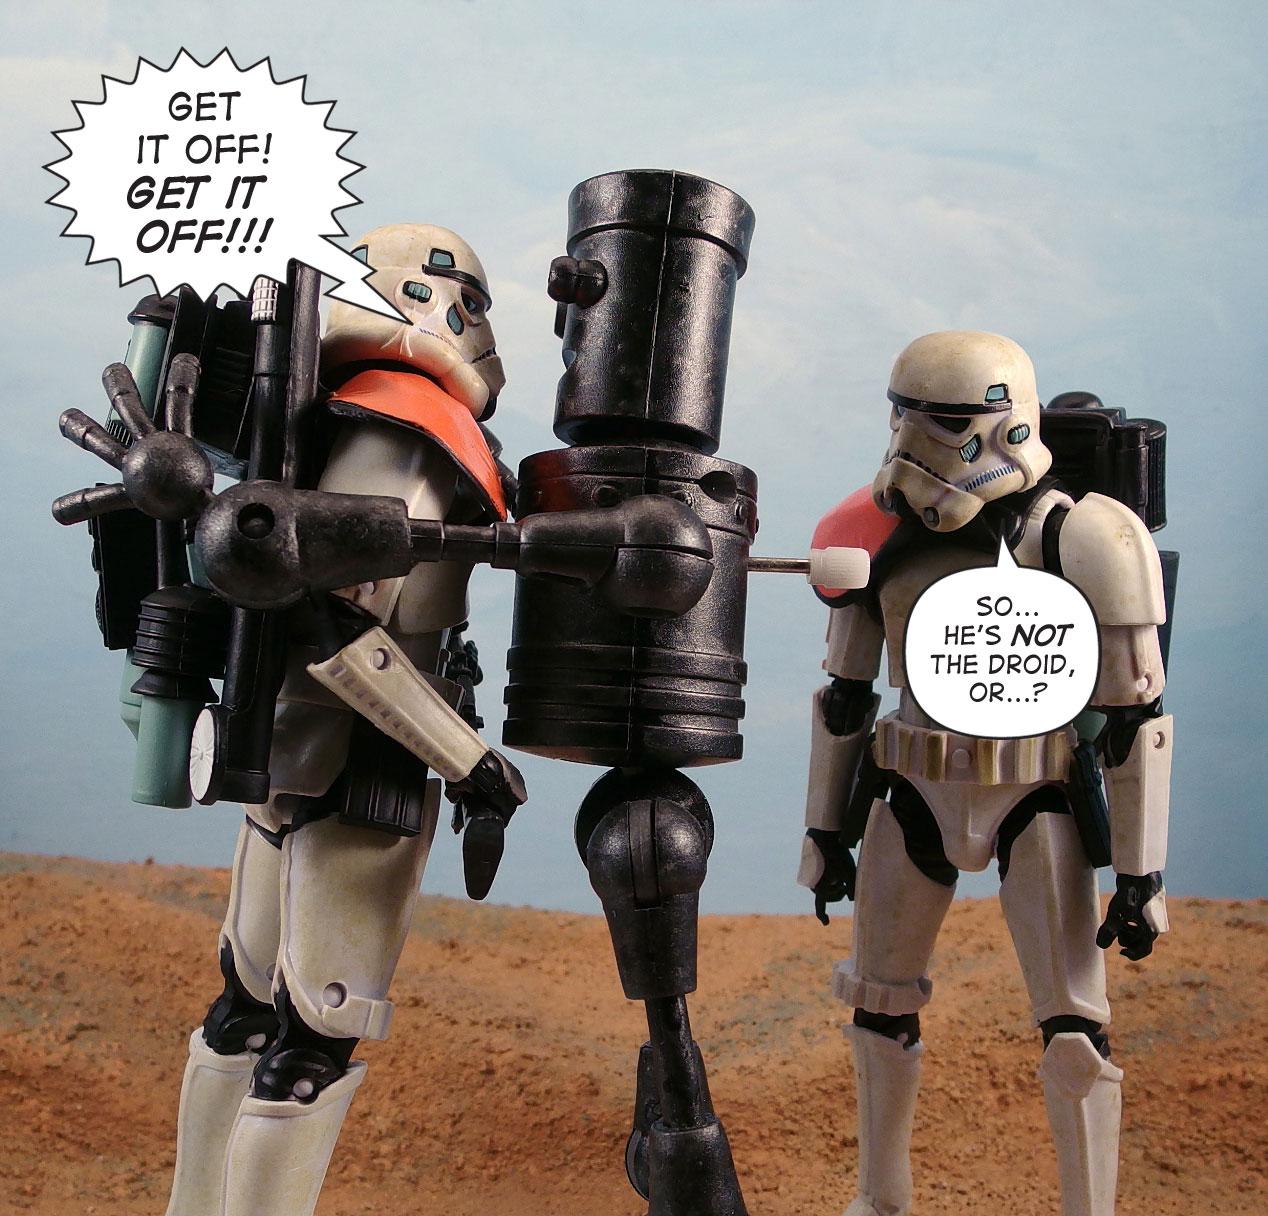 Get it off! GET IT OFF! / So, he's NOT the droid, or...?